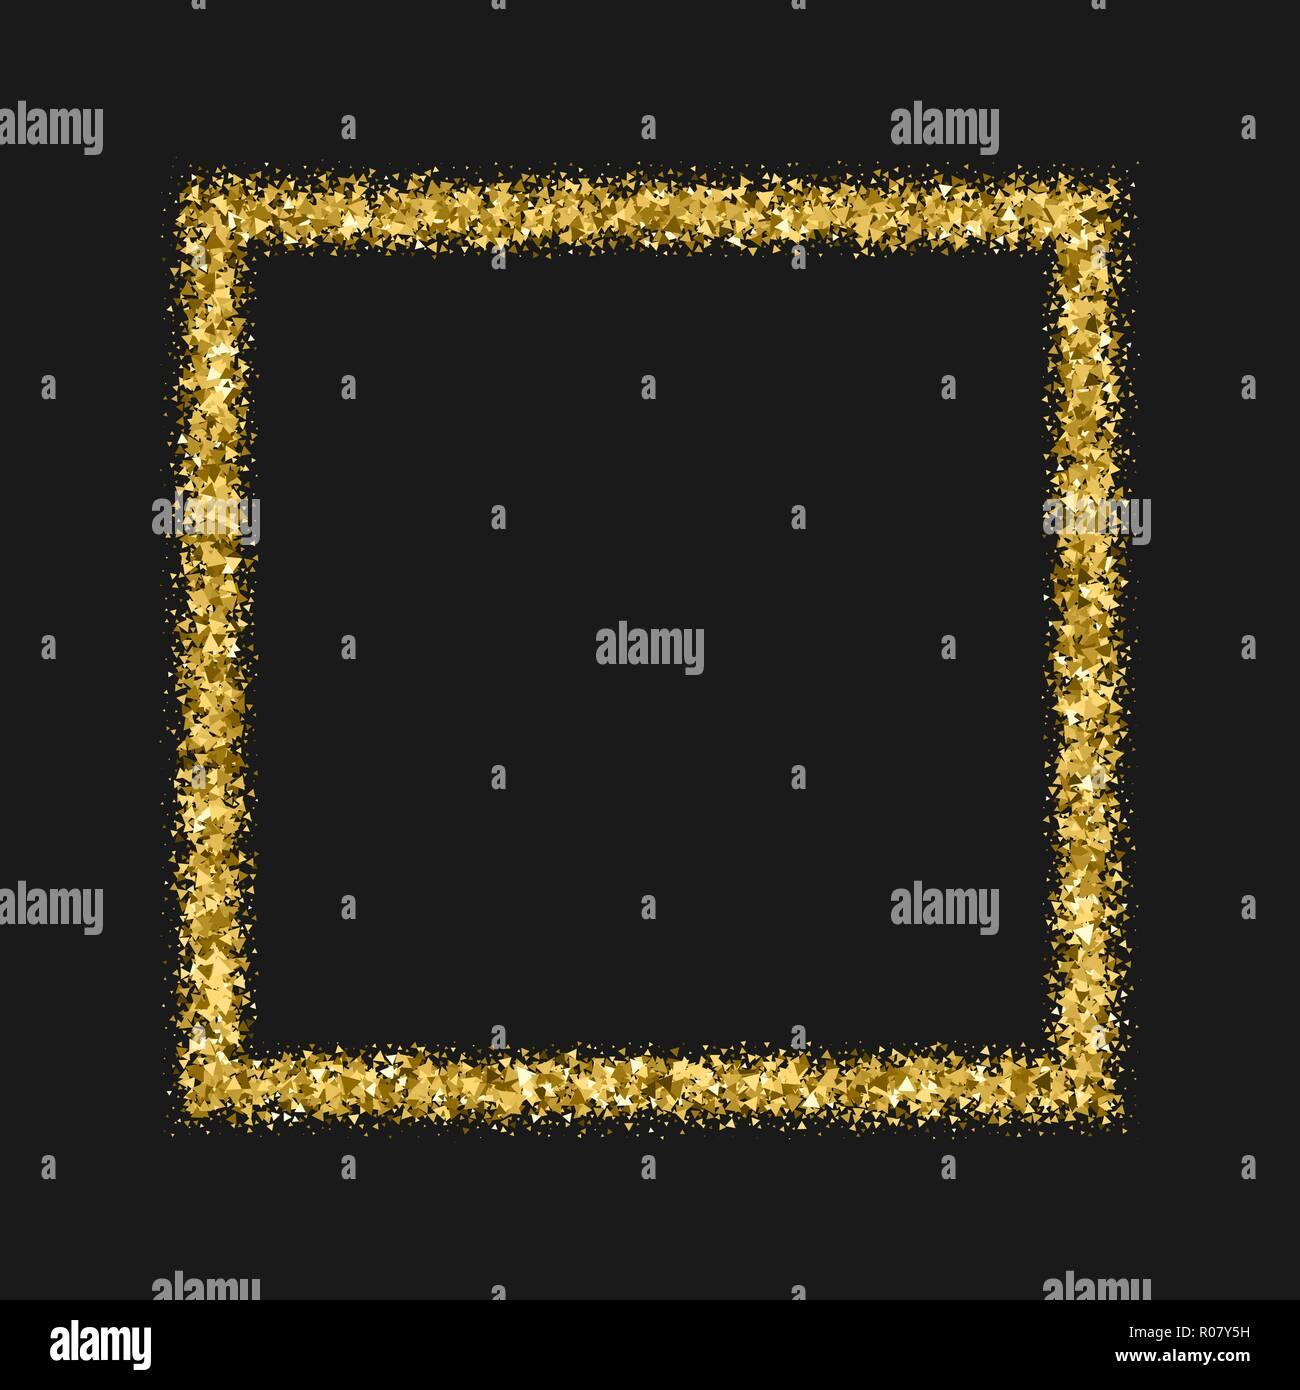 golden frame glitter texture isolated on black editable template